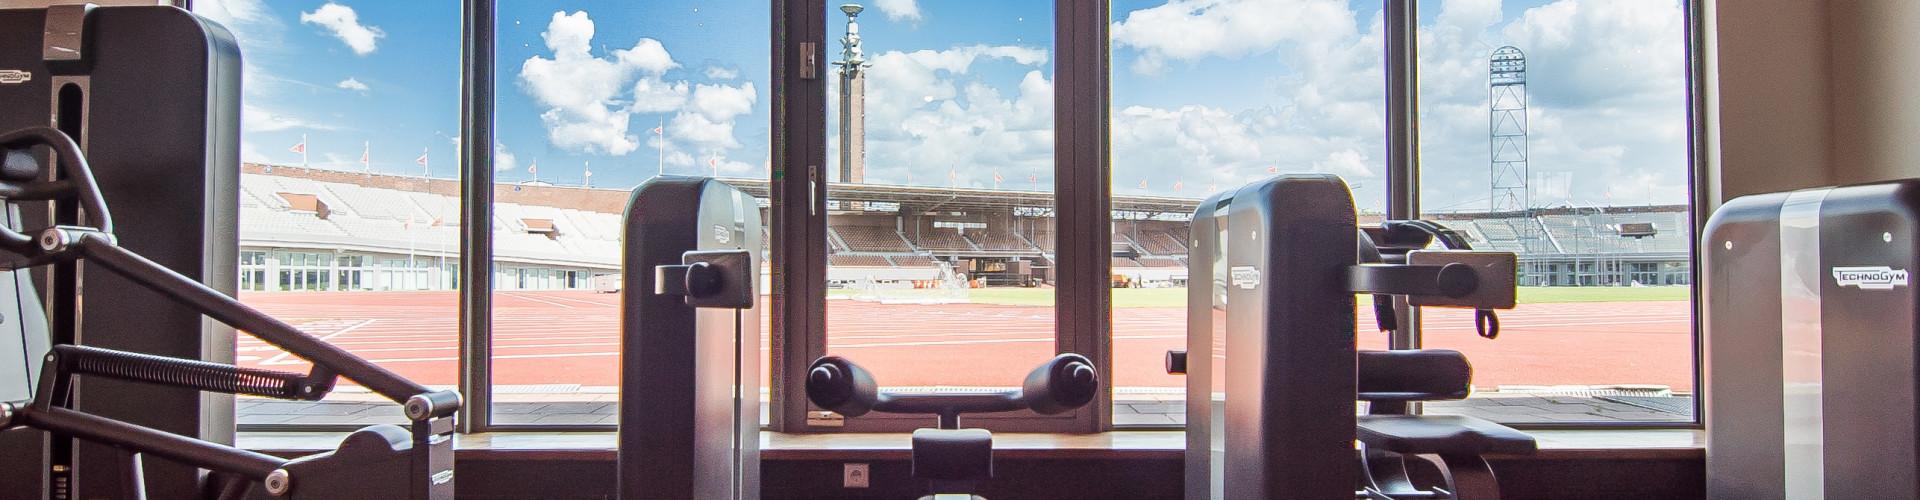 Prijzen Olympic Gym Amsterdam